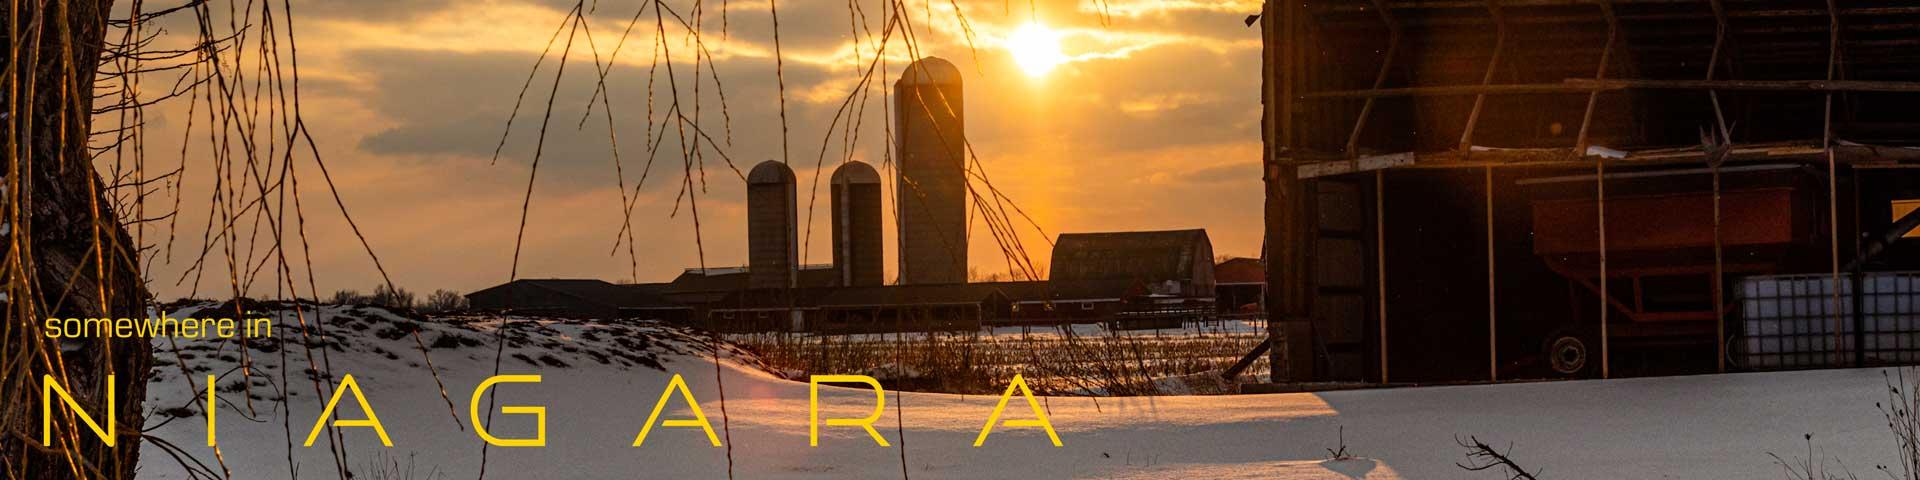 Somewhere In Niagara - Winter Sun on Snow